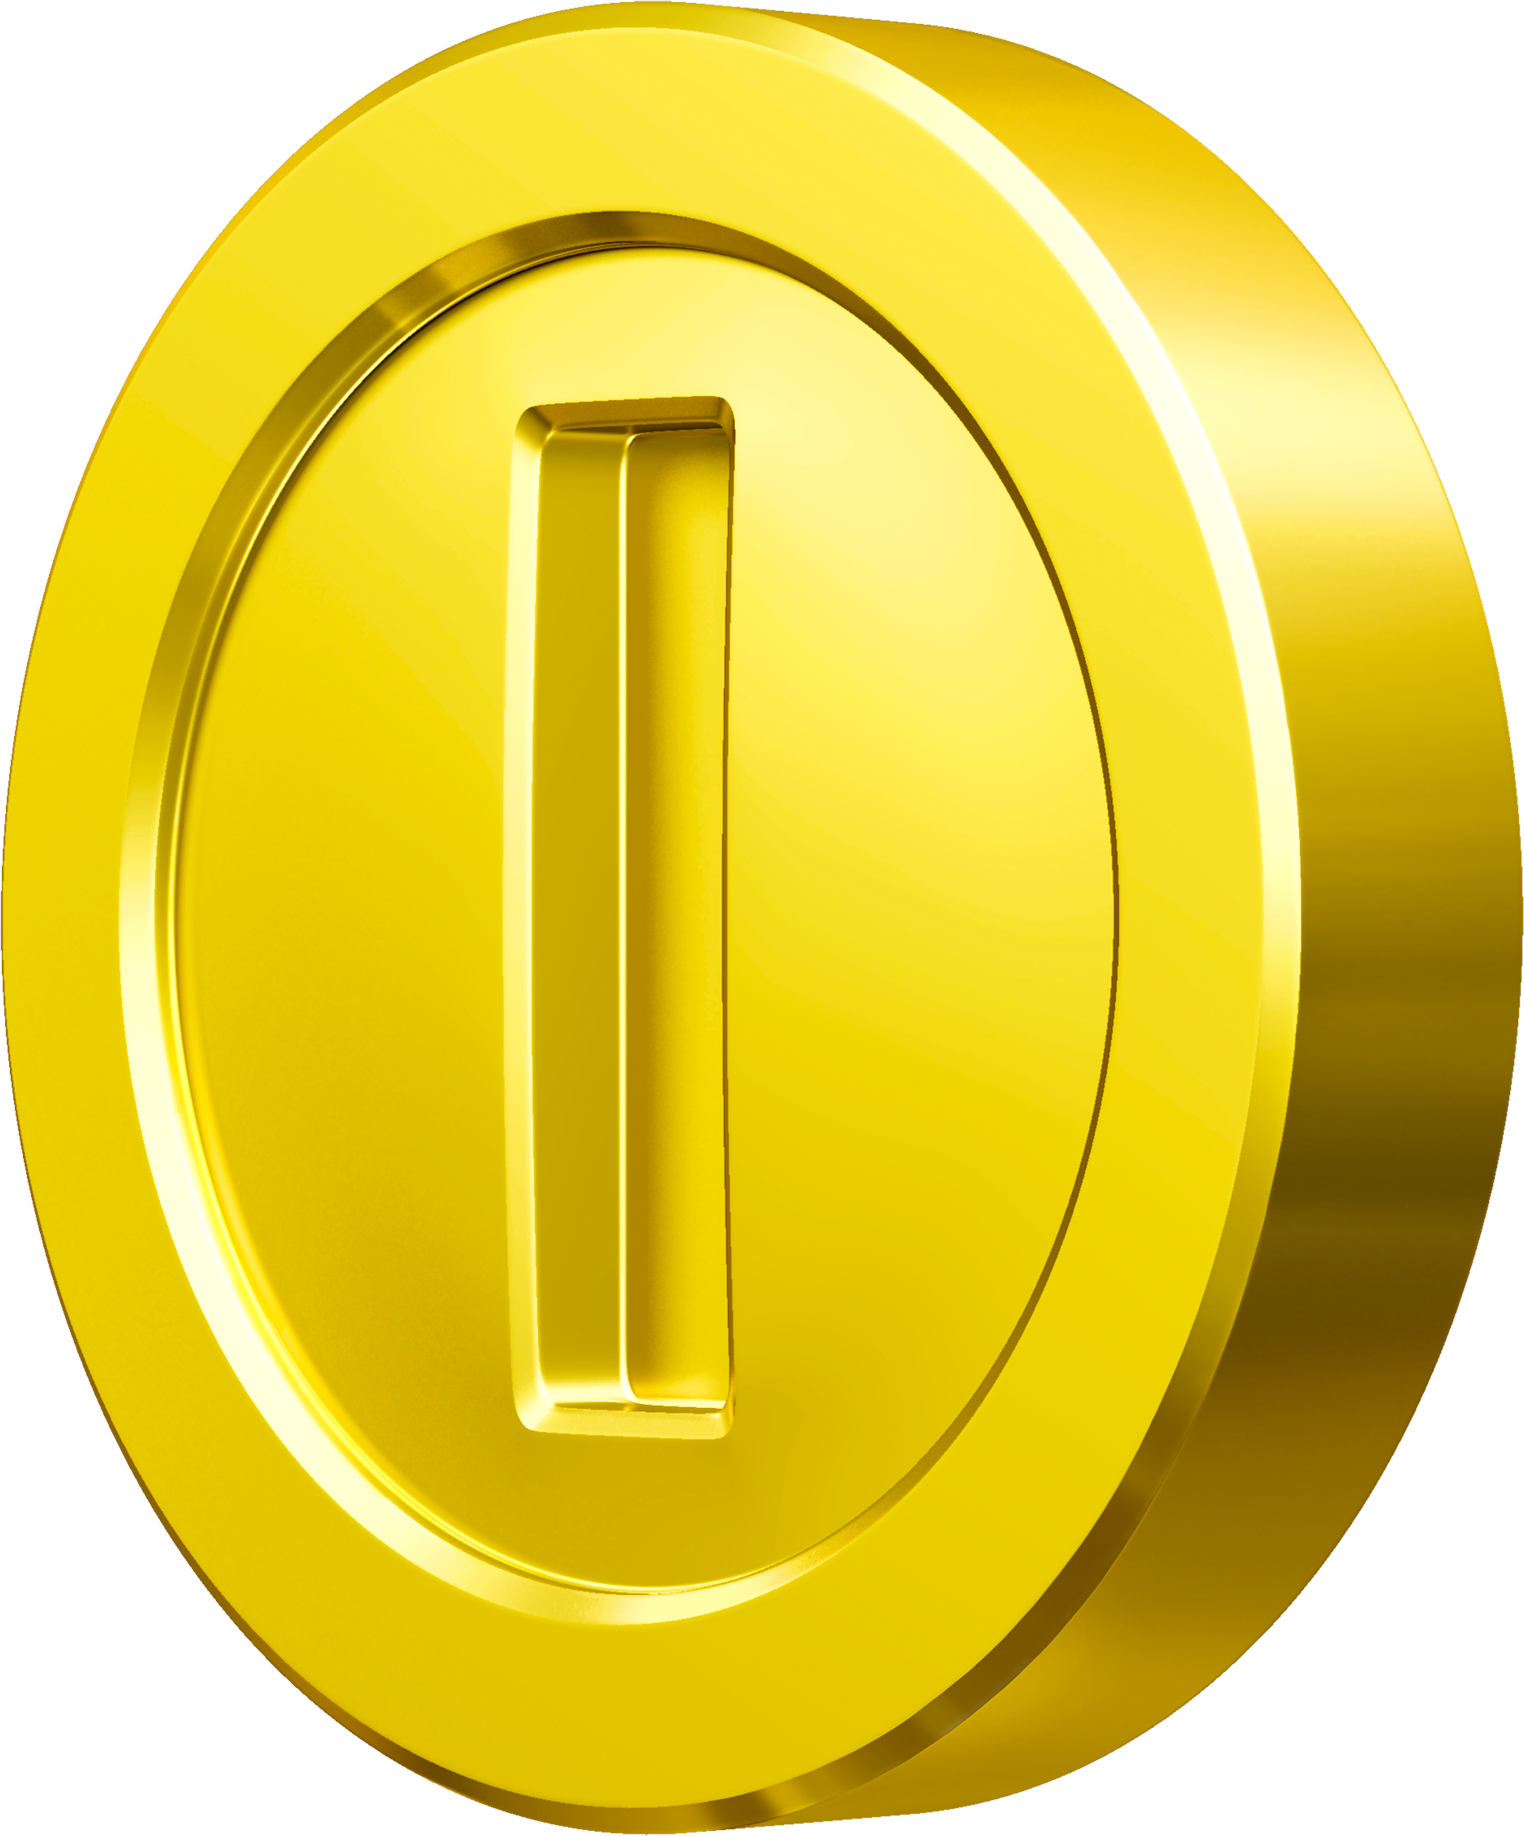 Coin Voice Ringtone Pagalworld Rhea Coin Location Games